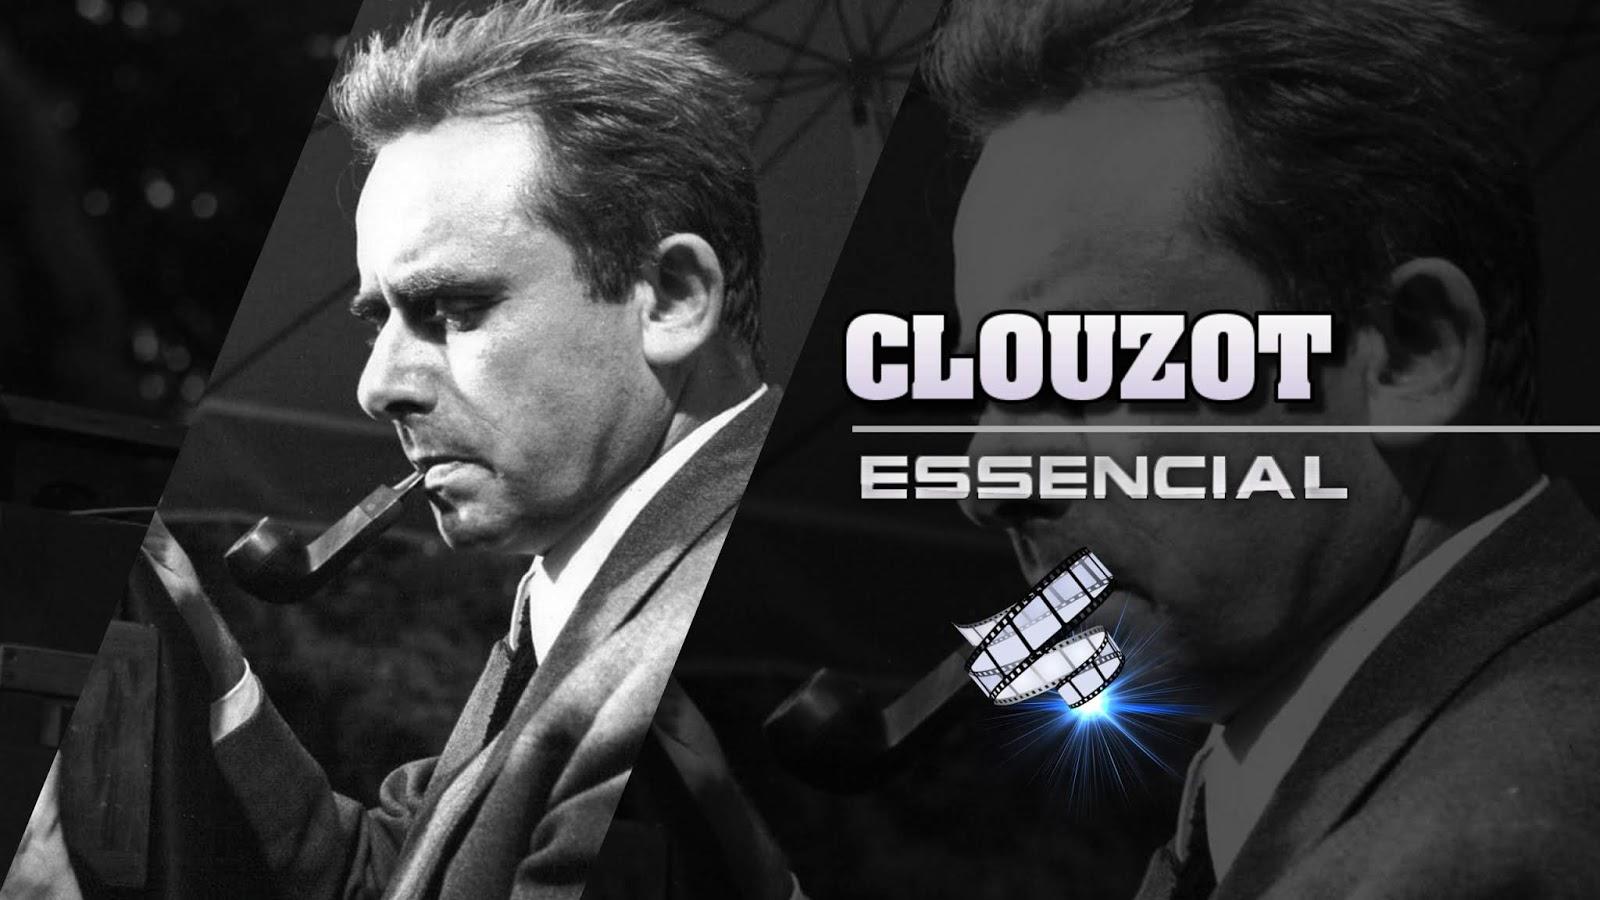 HENRI-GEORGES CLOUZOT - 10 FILMES ESSENCIAIS